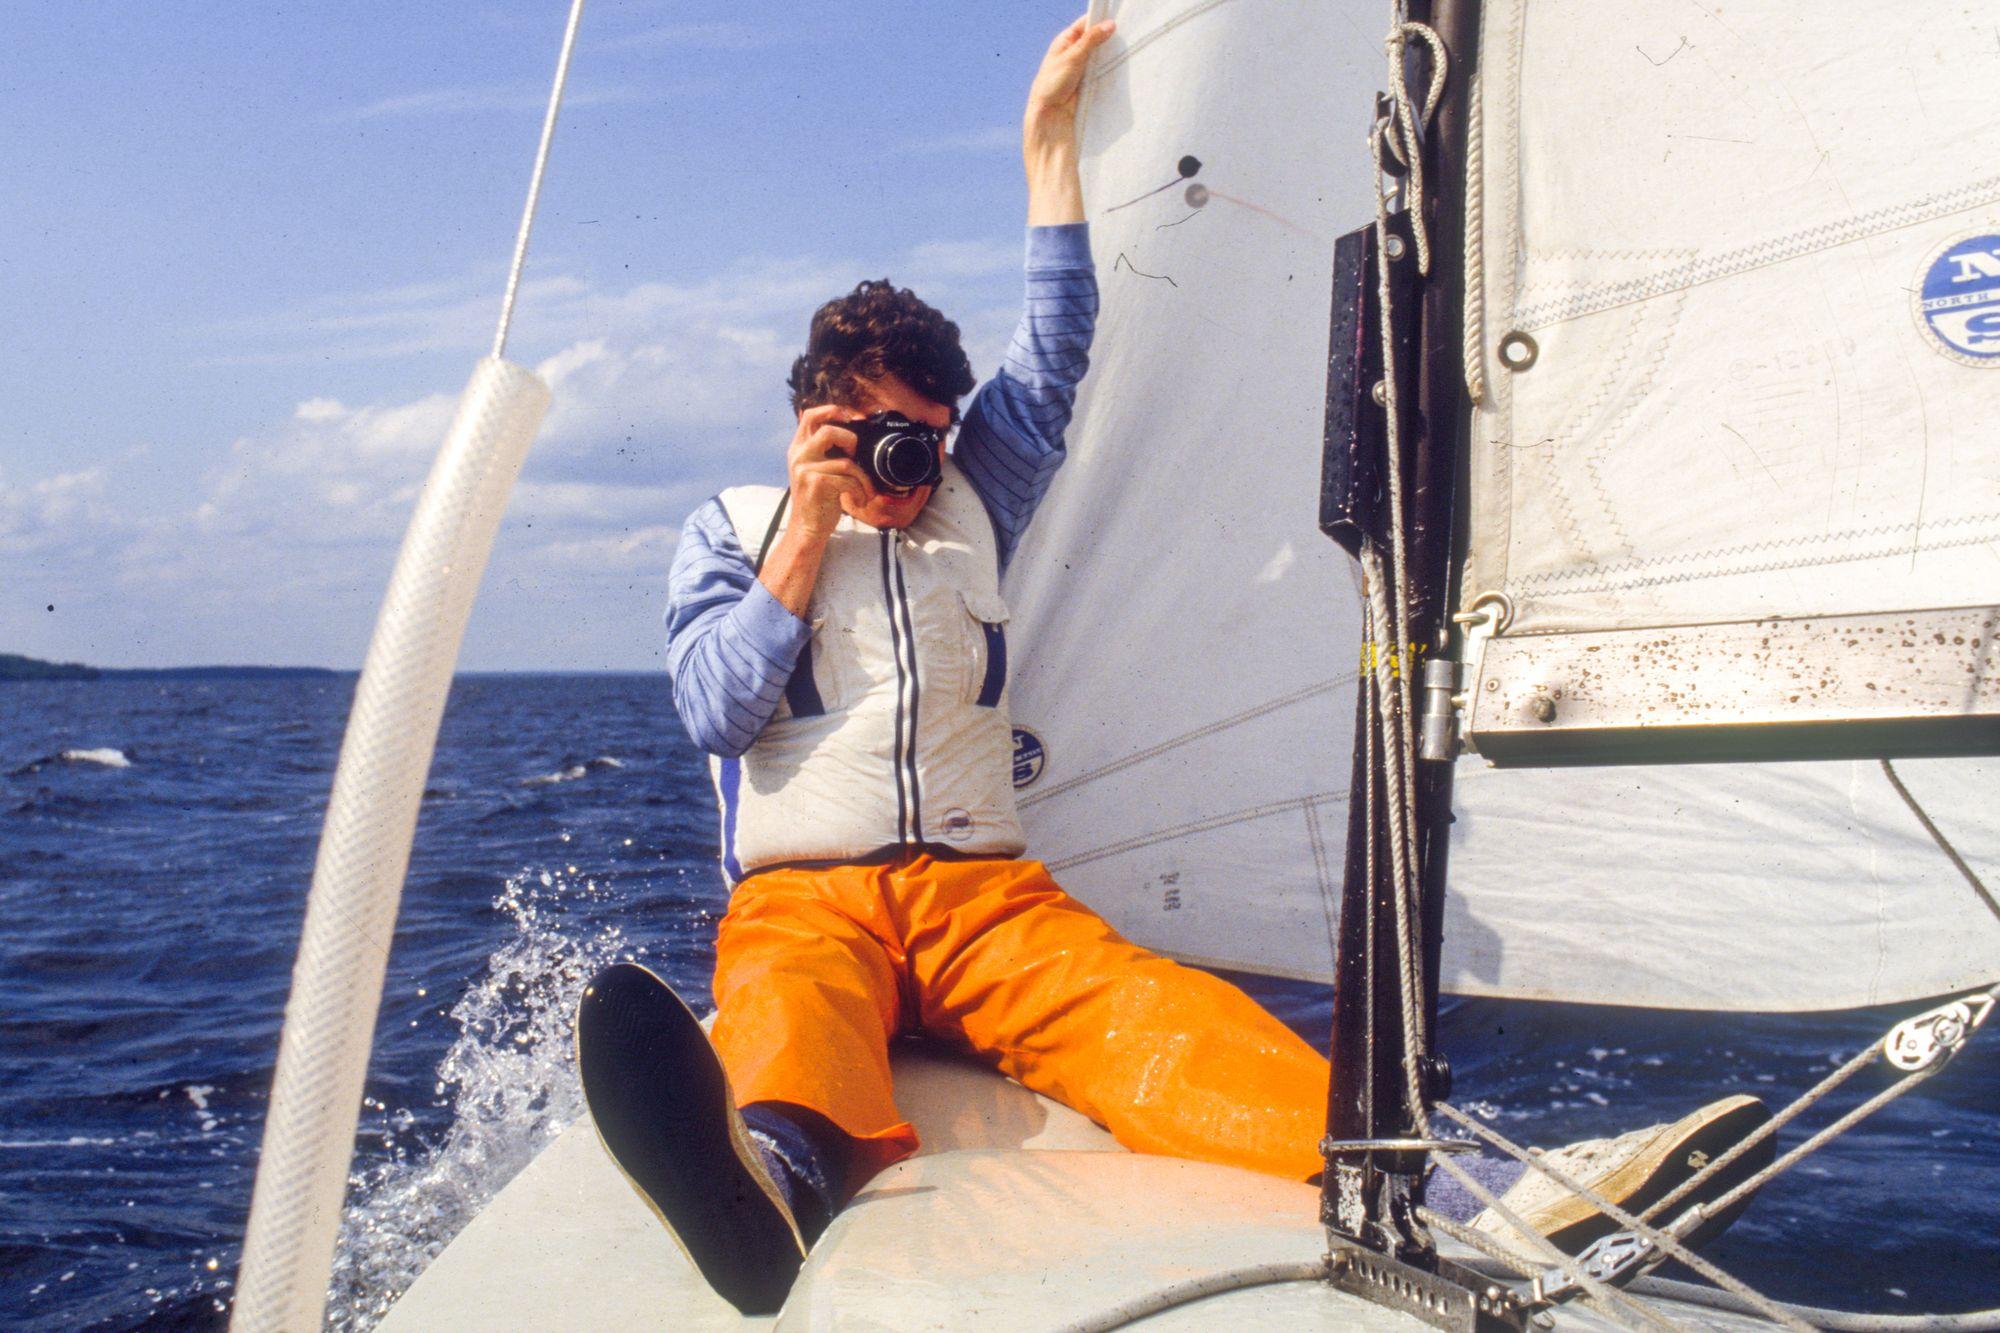 Fotograf Svend Krumnacker 1985 Nikon FM 2 24mm/2.8